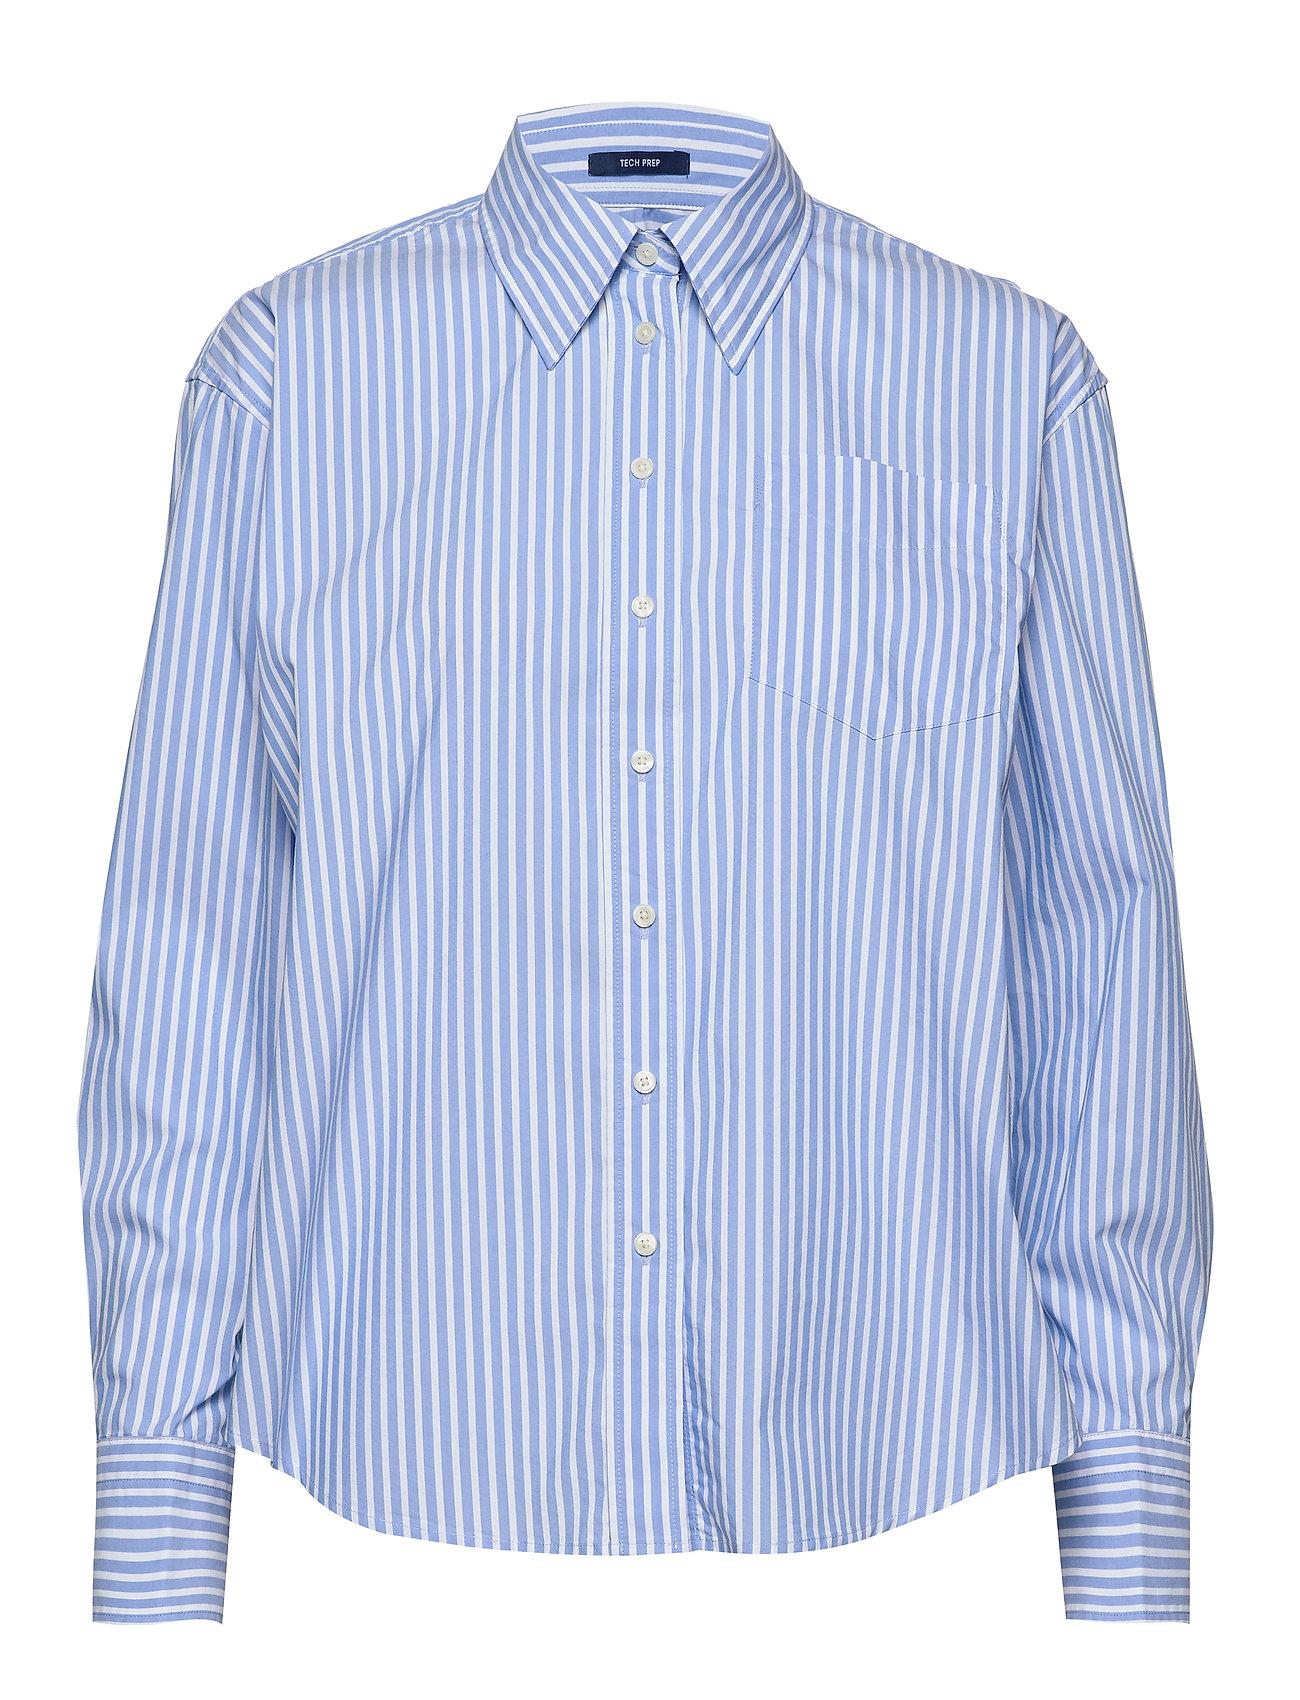 Gant D1. TP STRIPED BUSINESS EXB SHIRT - PACIFIC BLUE